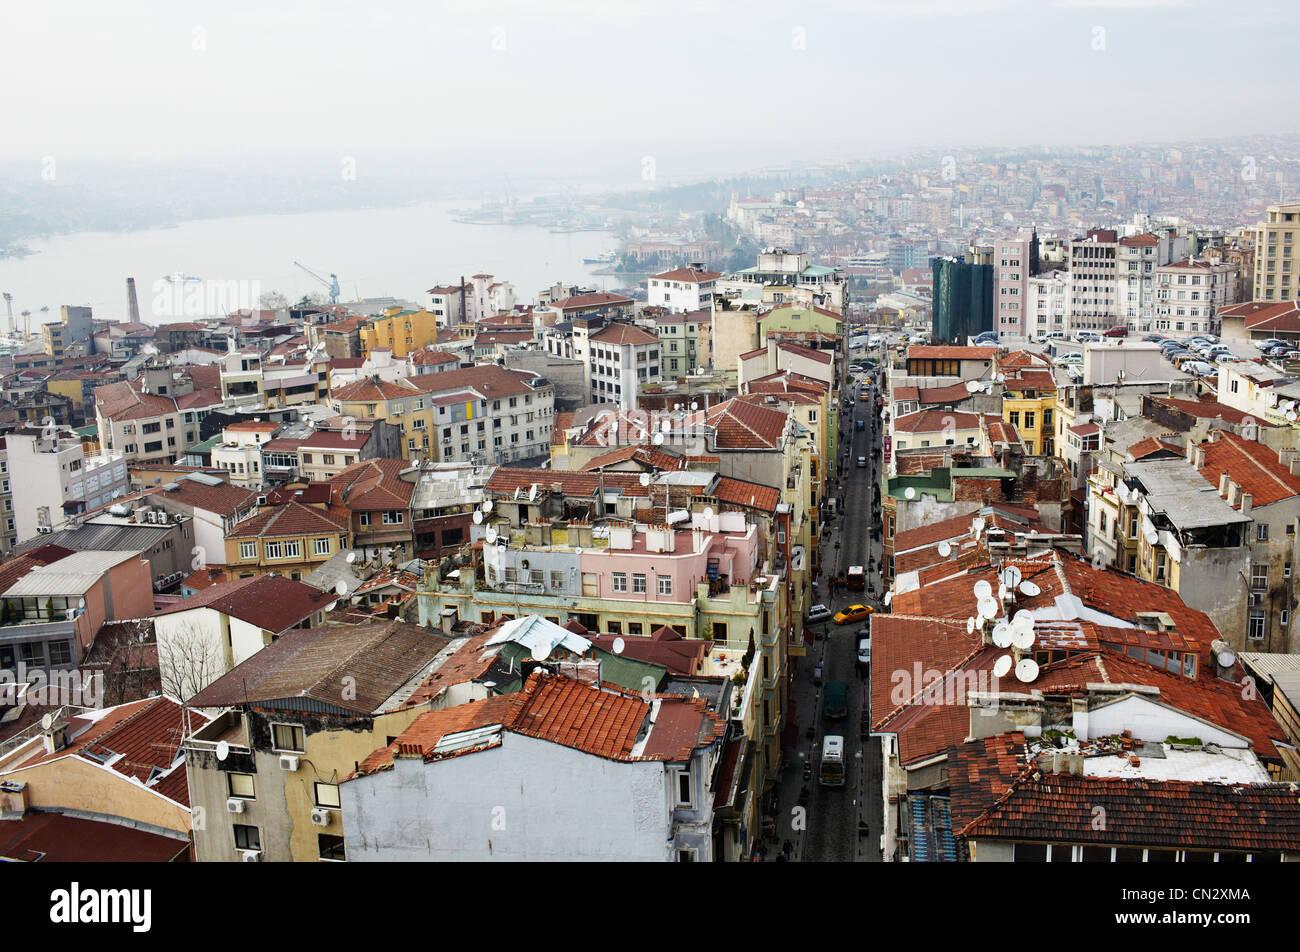 Edifici e tetti, Istanbul, Turchia Immagini Stock